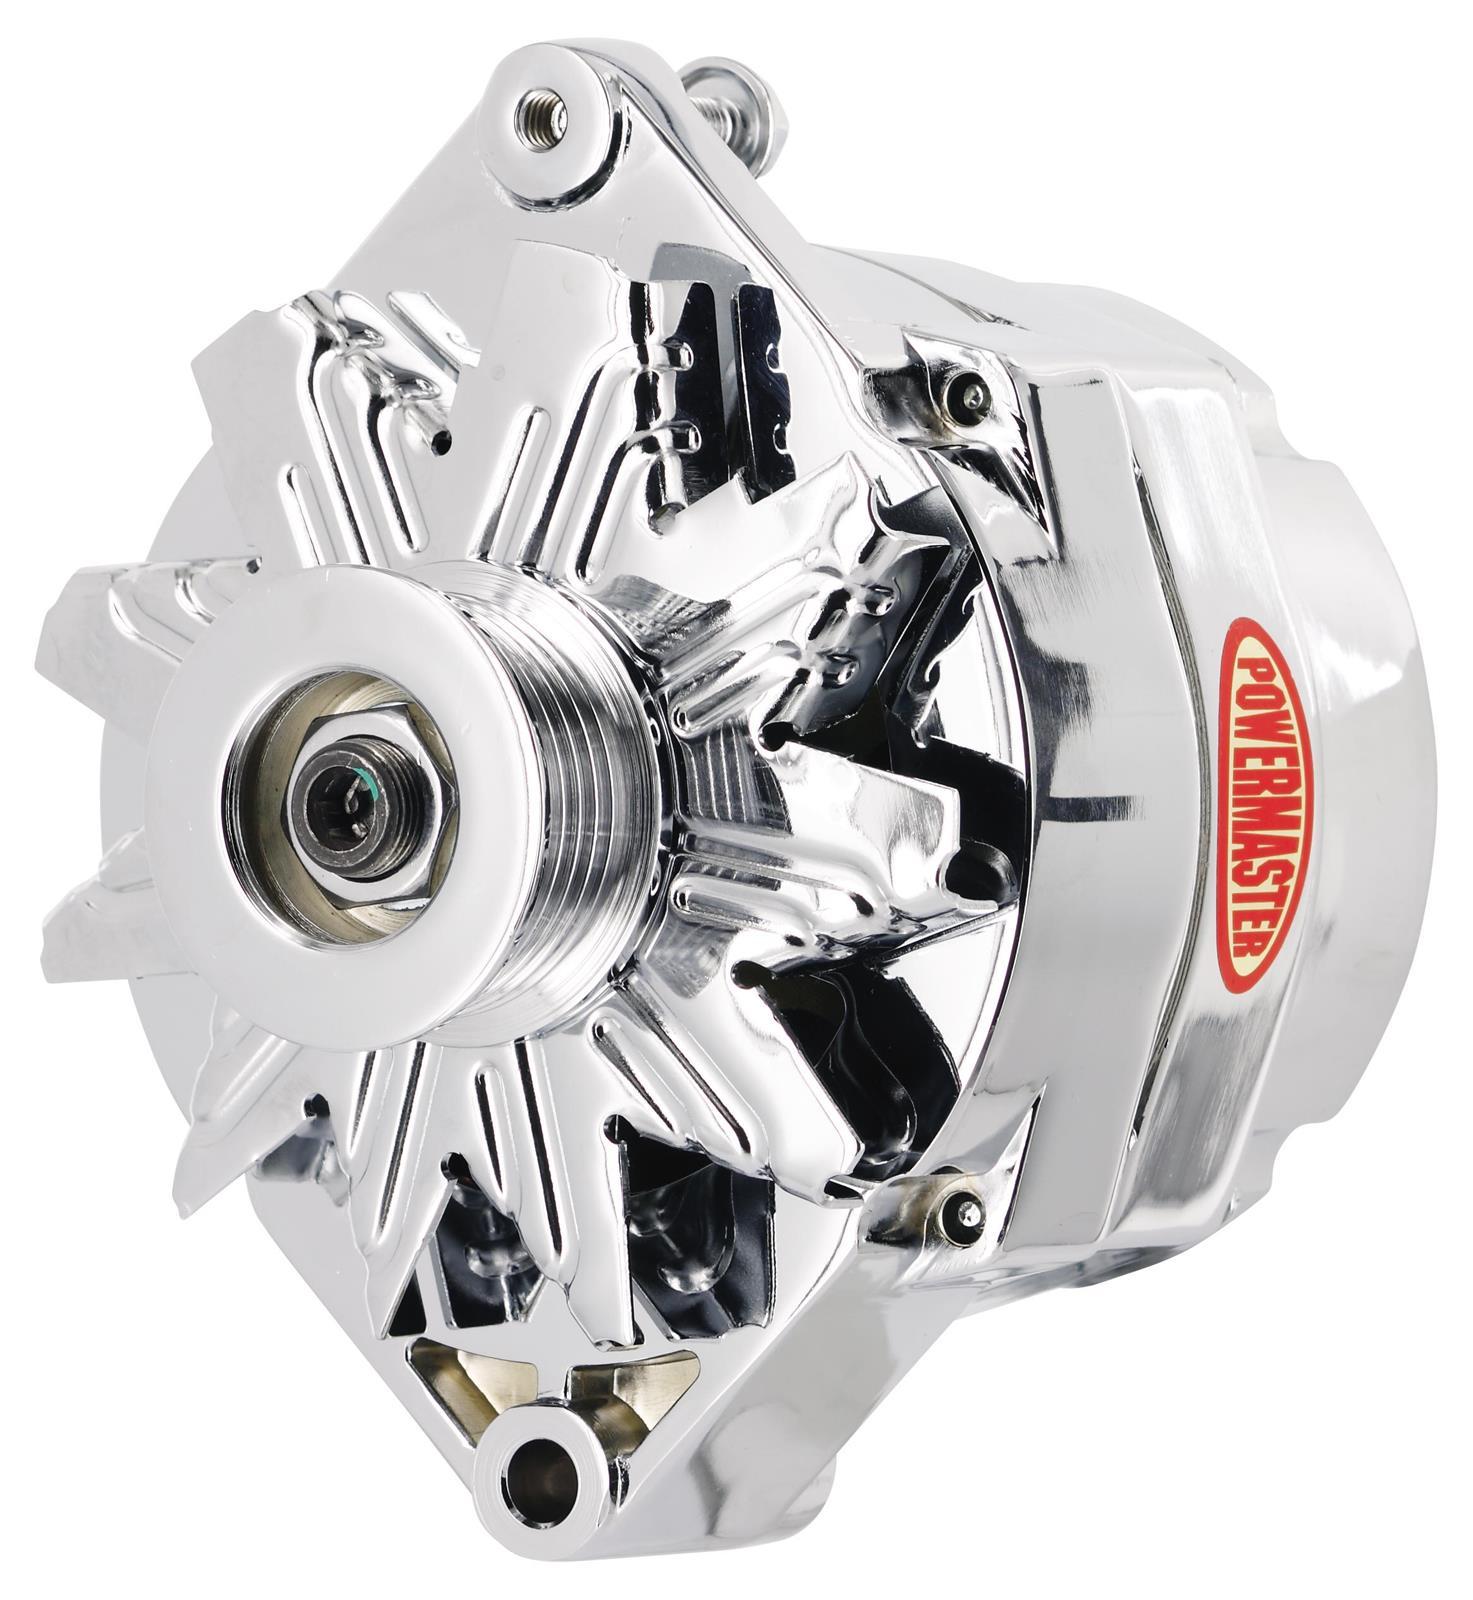 hight resolution of jeep cj7 powermaster street alternators 17294 114 free shipping on orders over 99 at summit racing